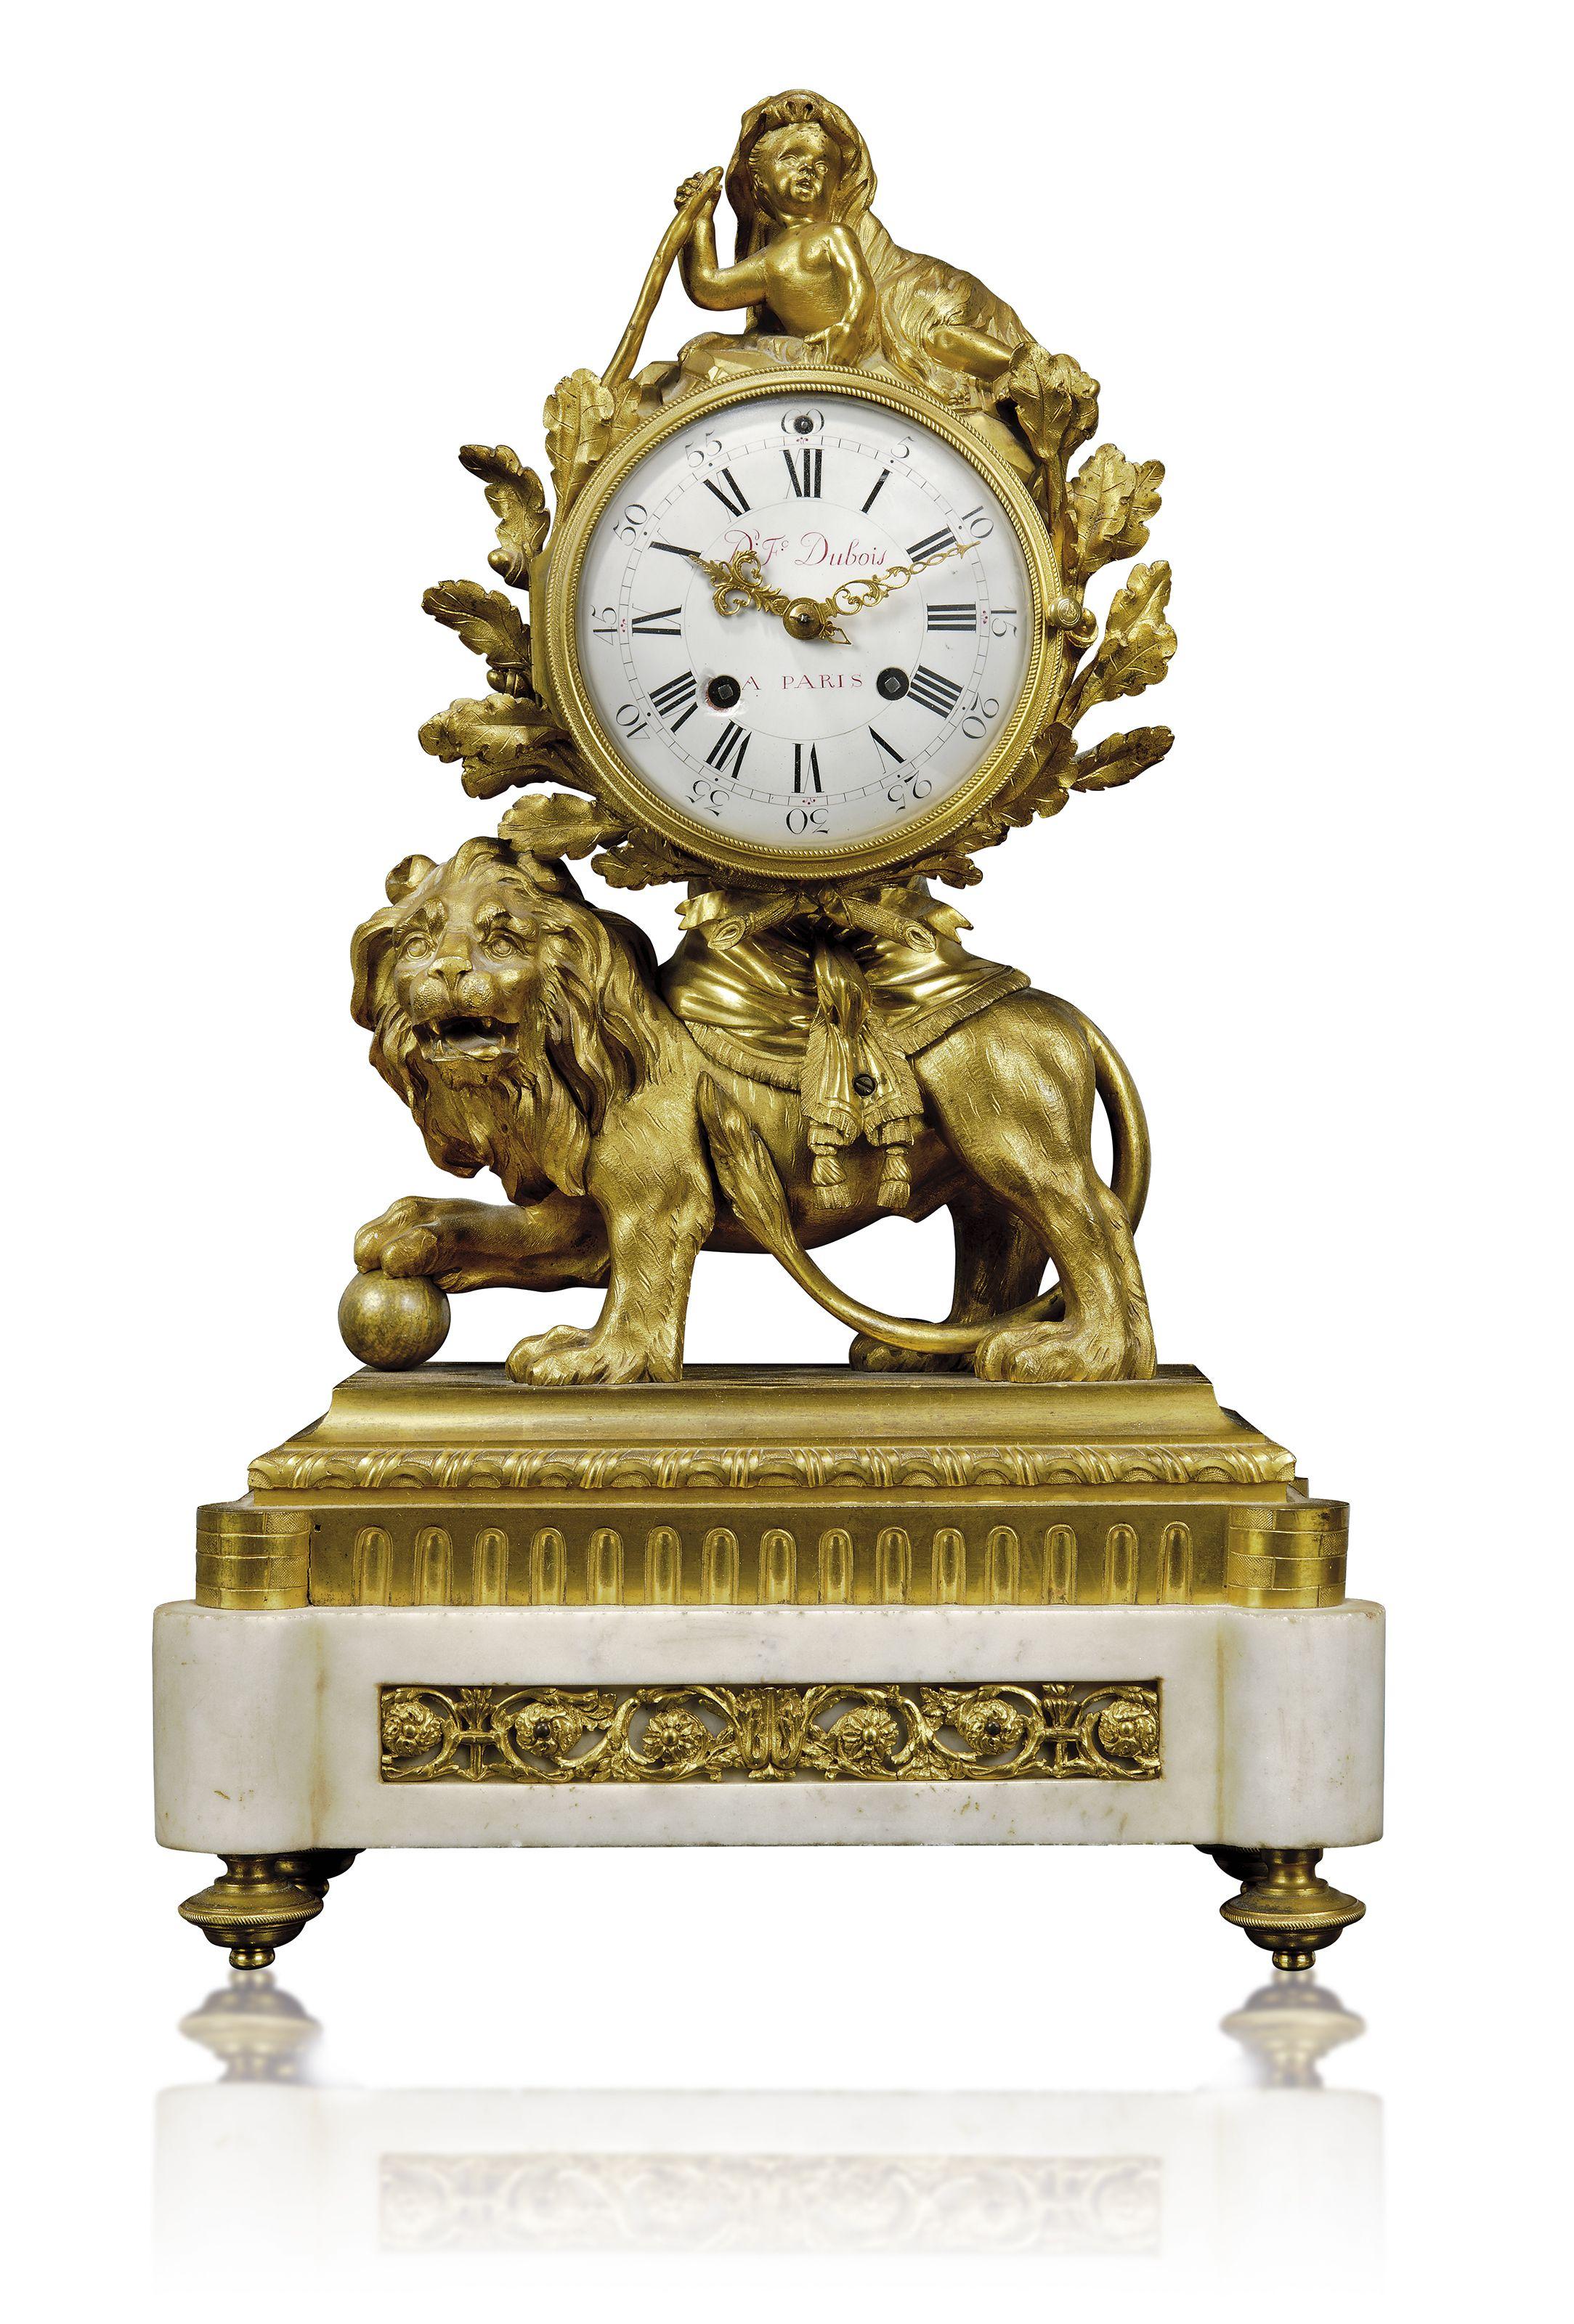 C1780 85 Louis Xvi Ormolu And White Marble Mantel Clock David Frederic Dubois Paris Circa 1780 85 The Case Attributed To Marie Jo Mantel Clock Clock Dubois